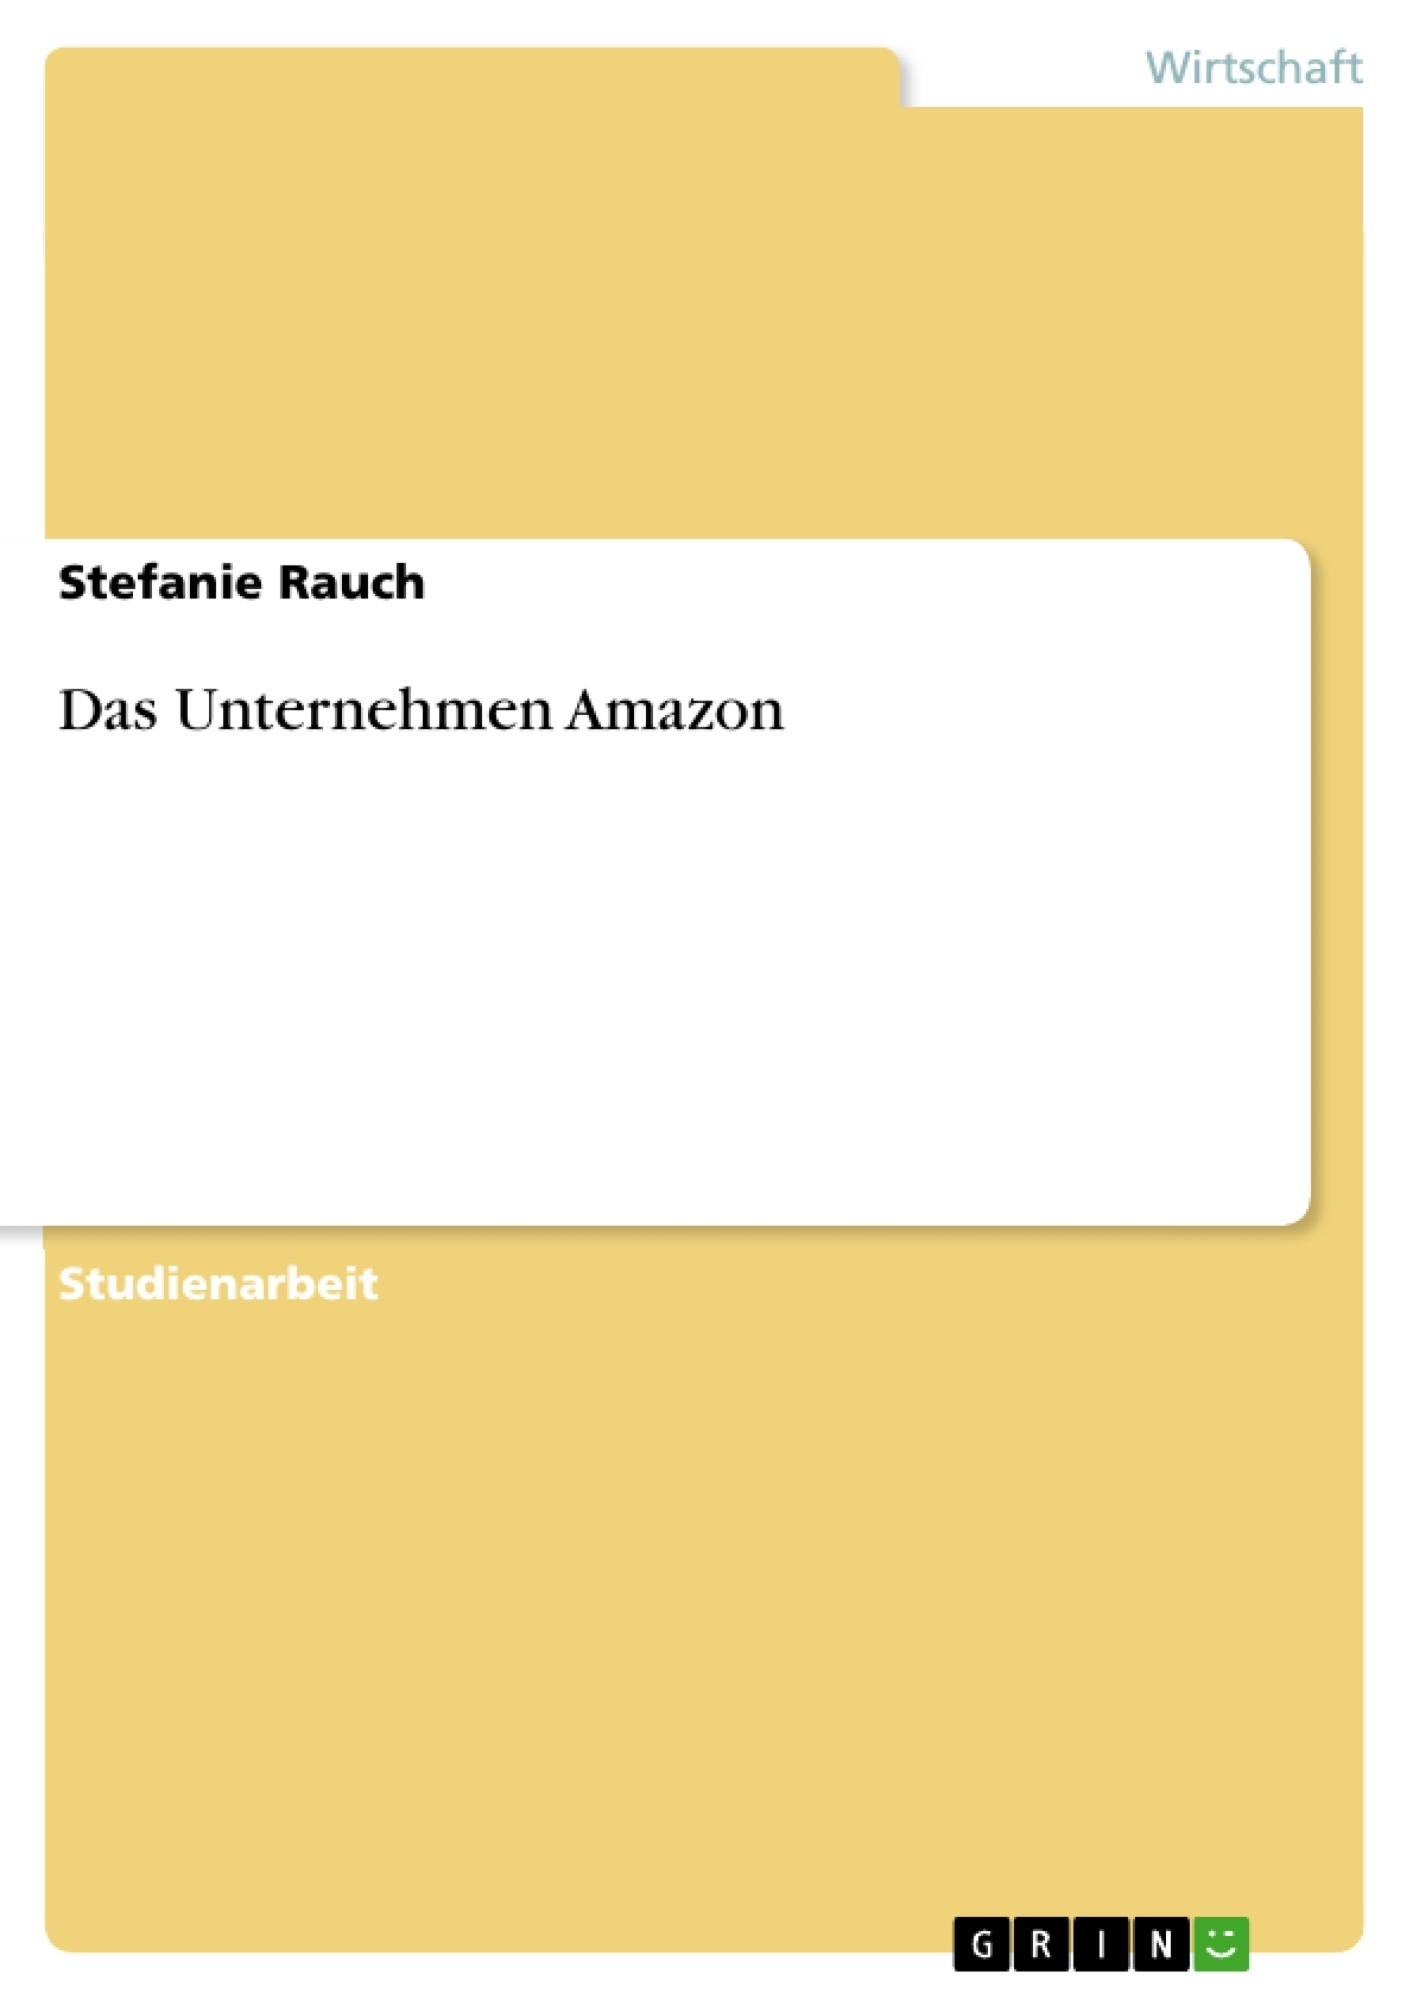 Titel: Das Unternehmen Amazon